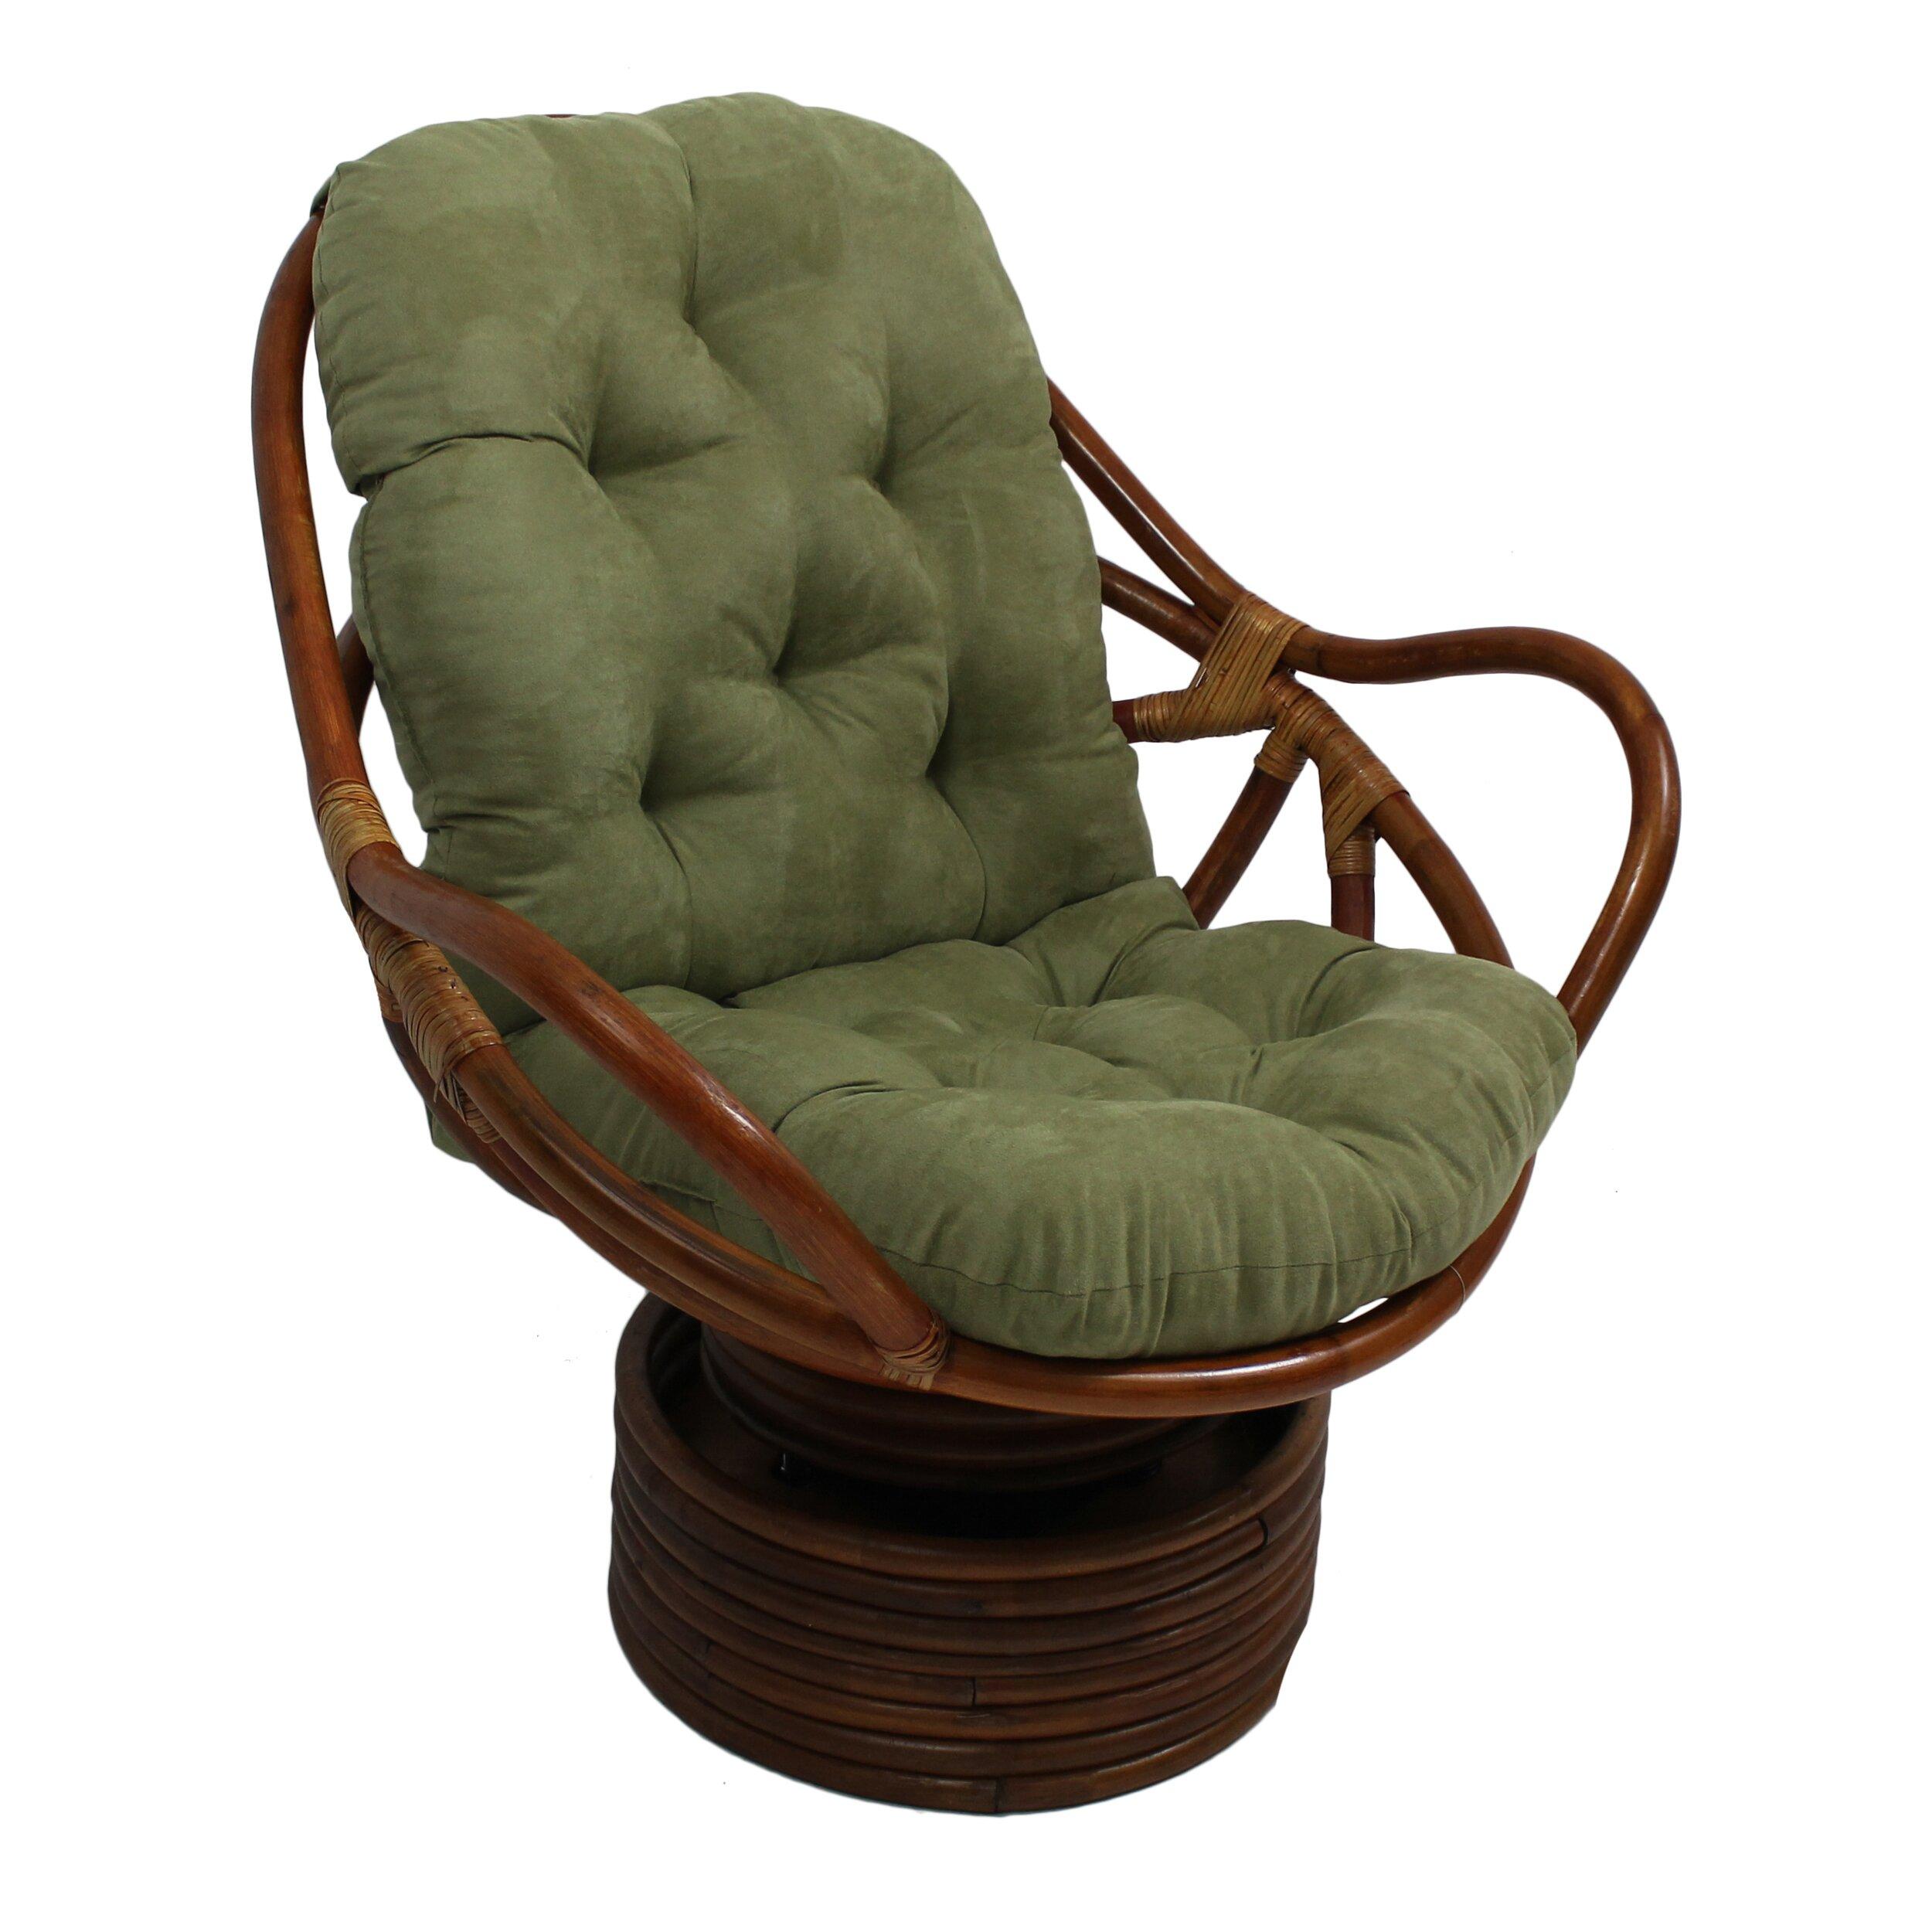 Make Wicker Chair Cushions Blazing Needles Premium Swivel Rocker Cushion